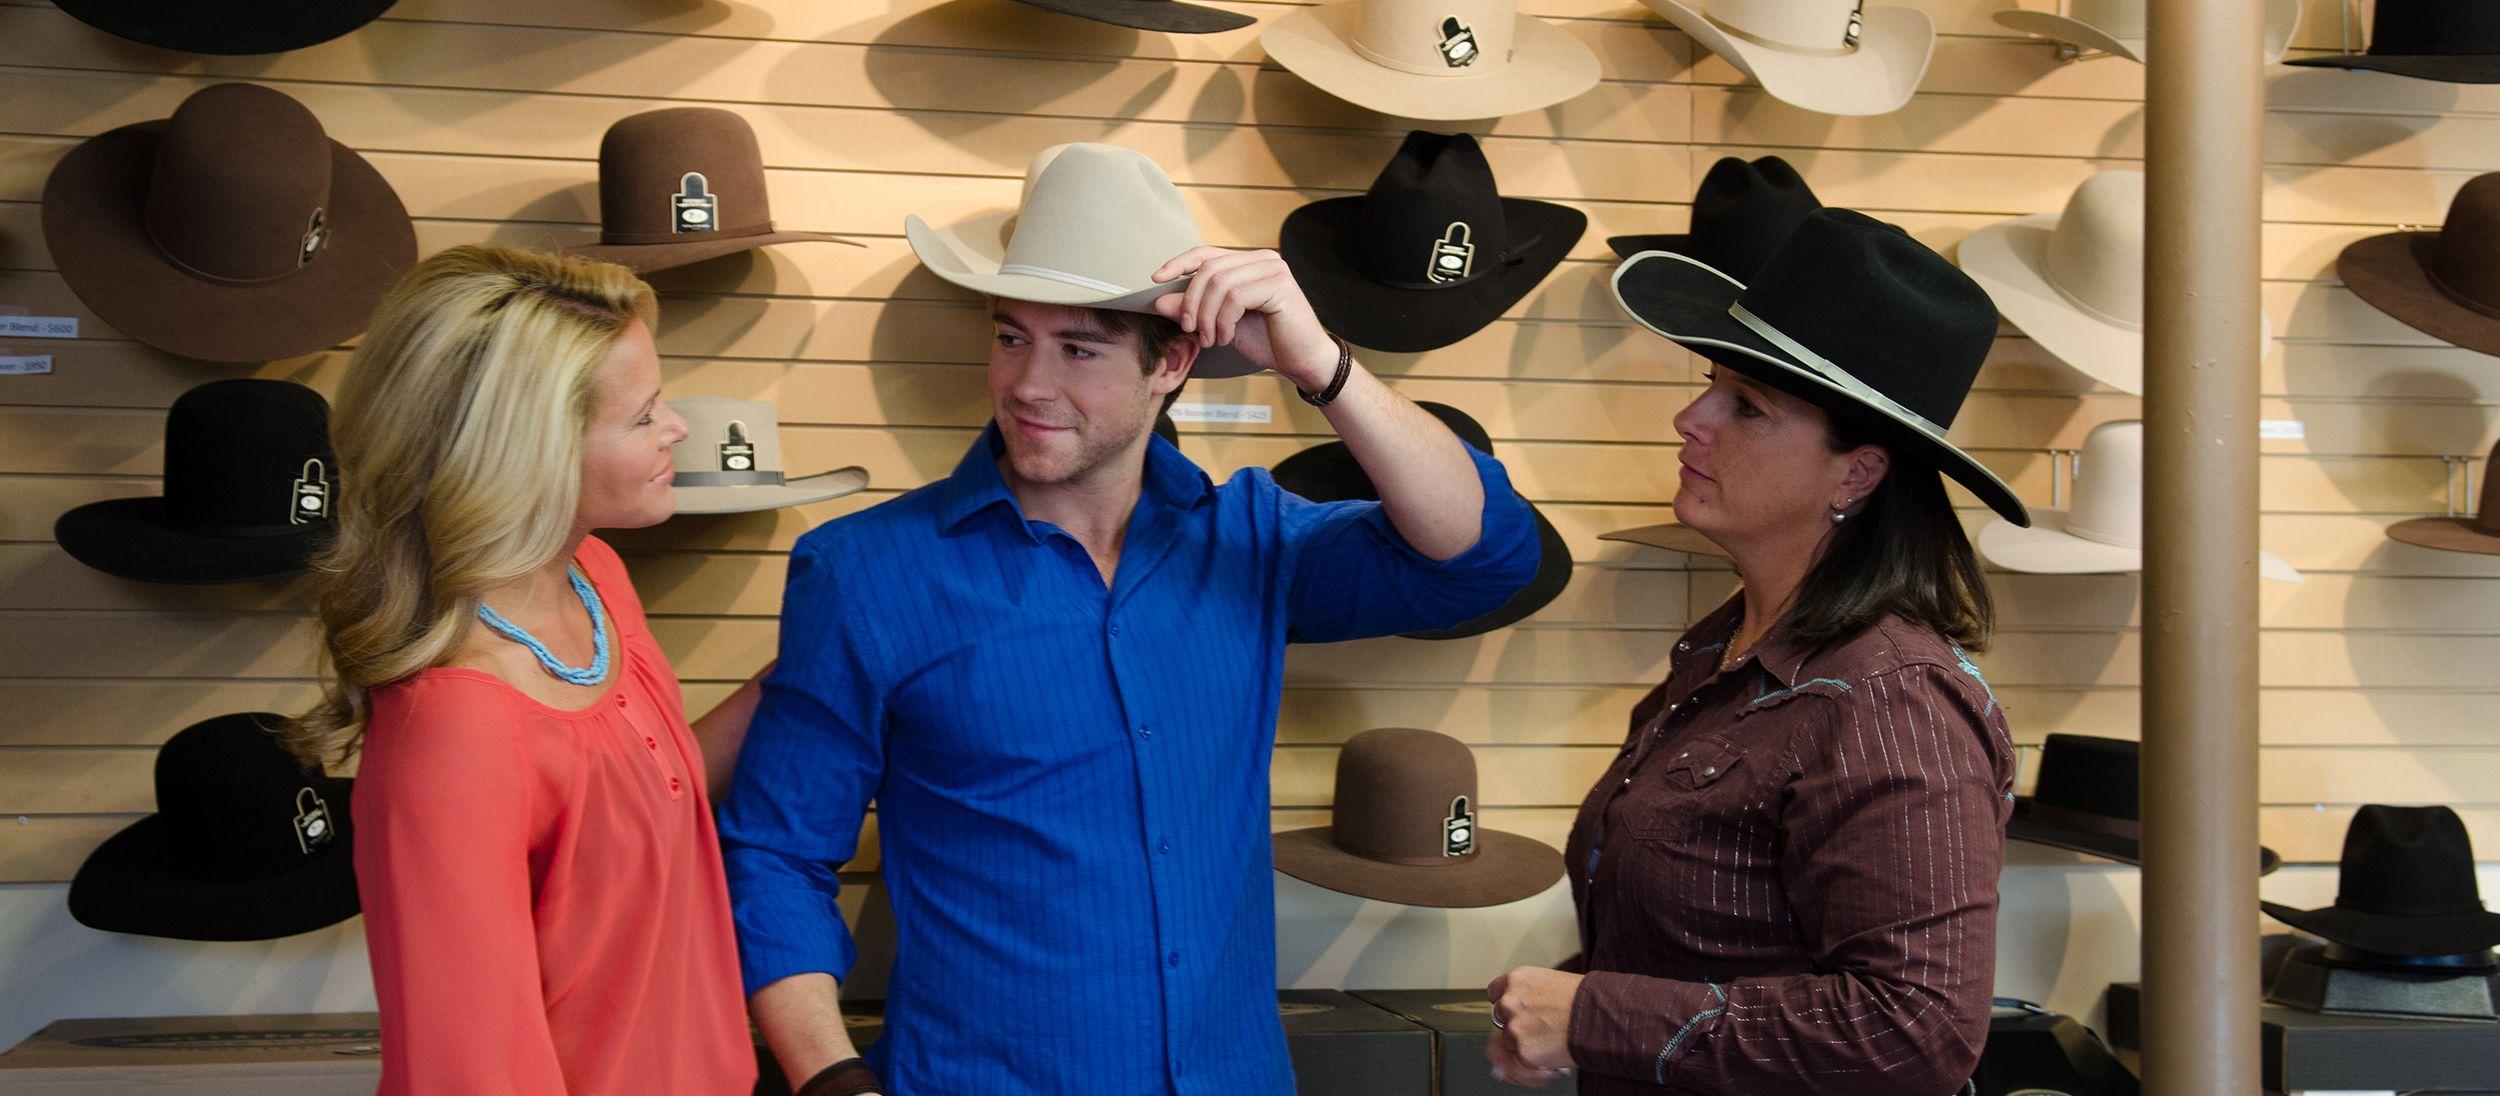 Hutanprobe im Smithbild Hats Laden in Calgary